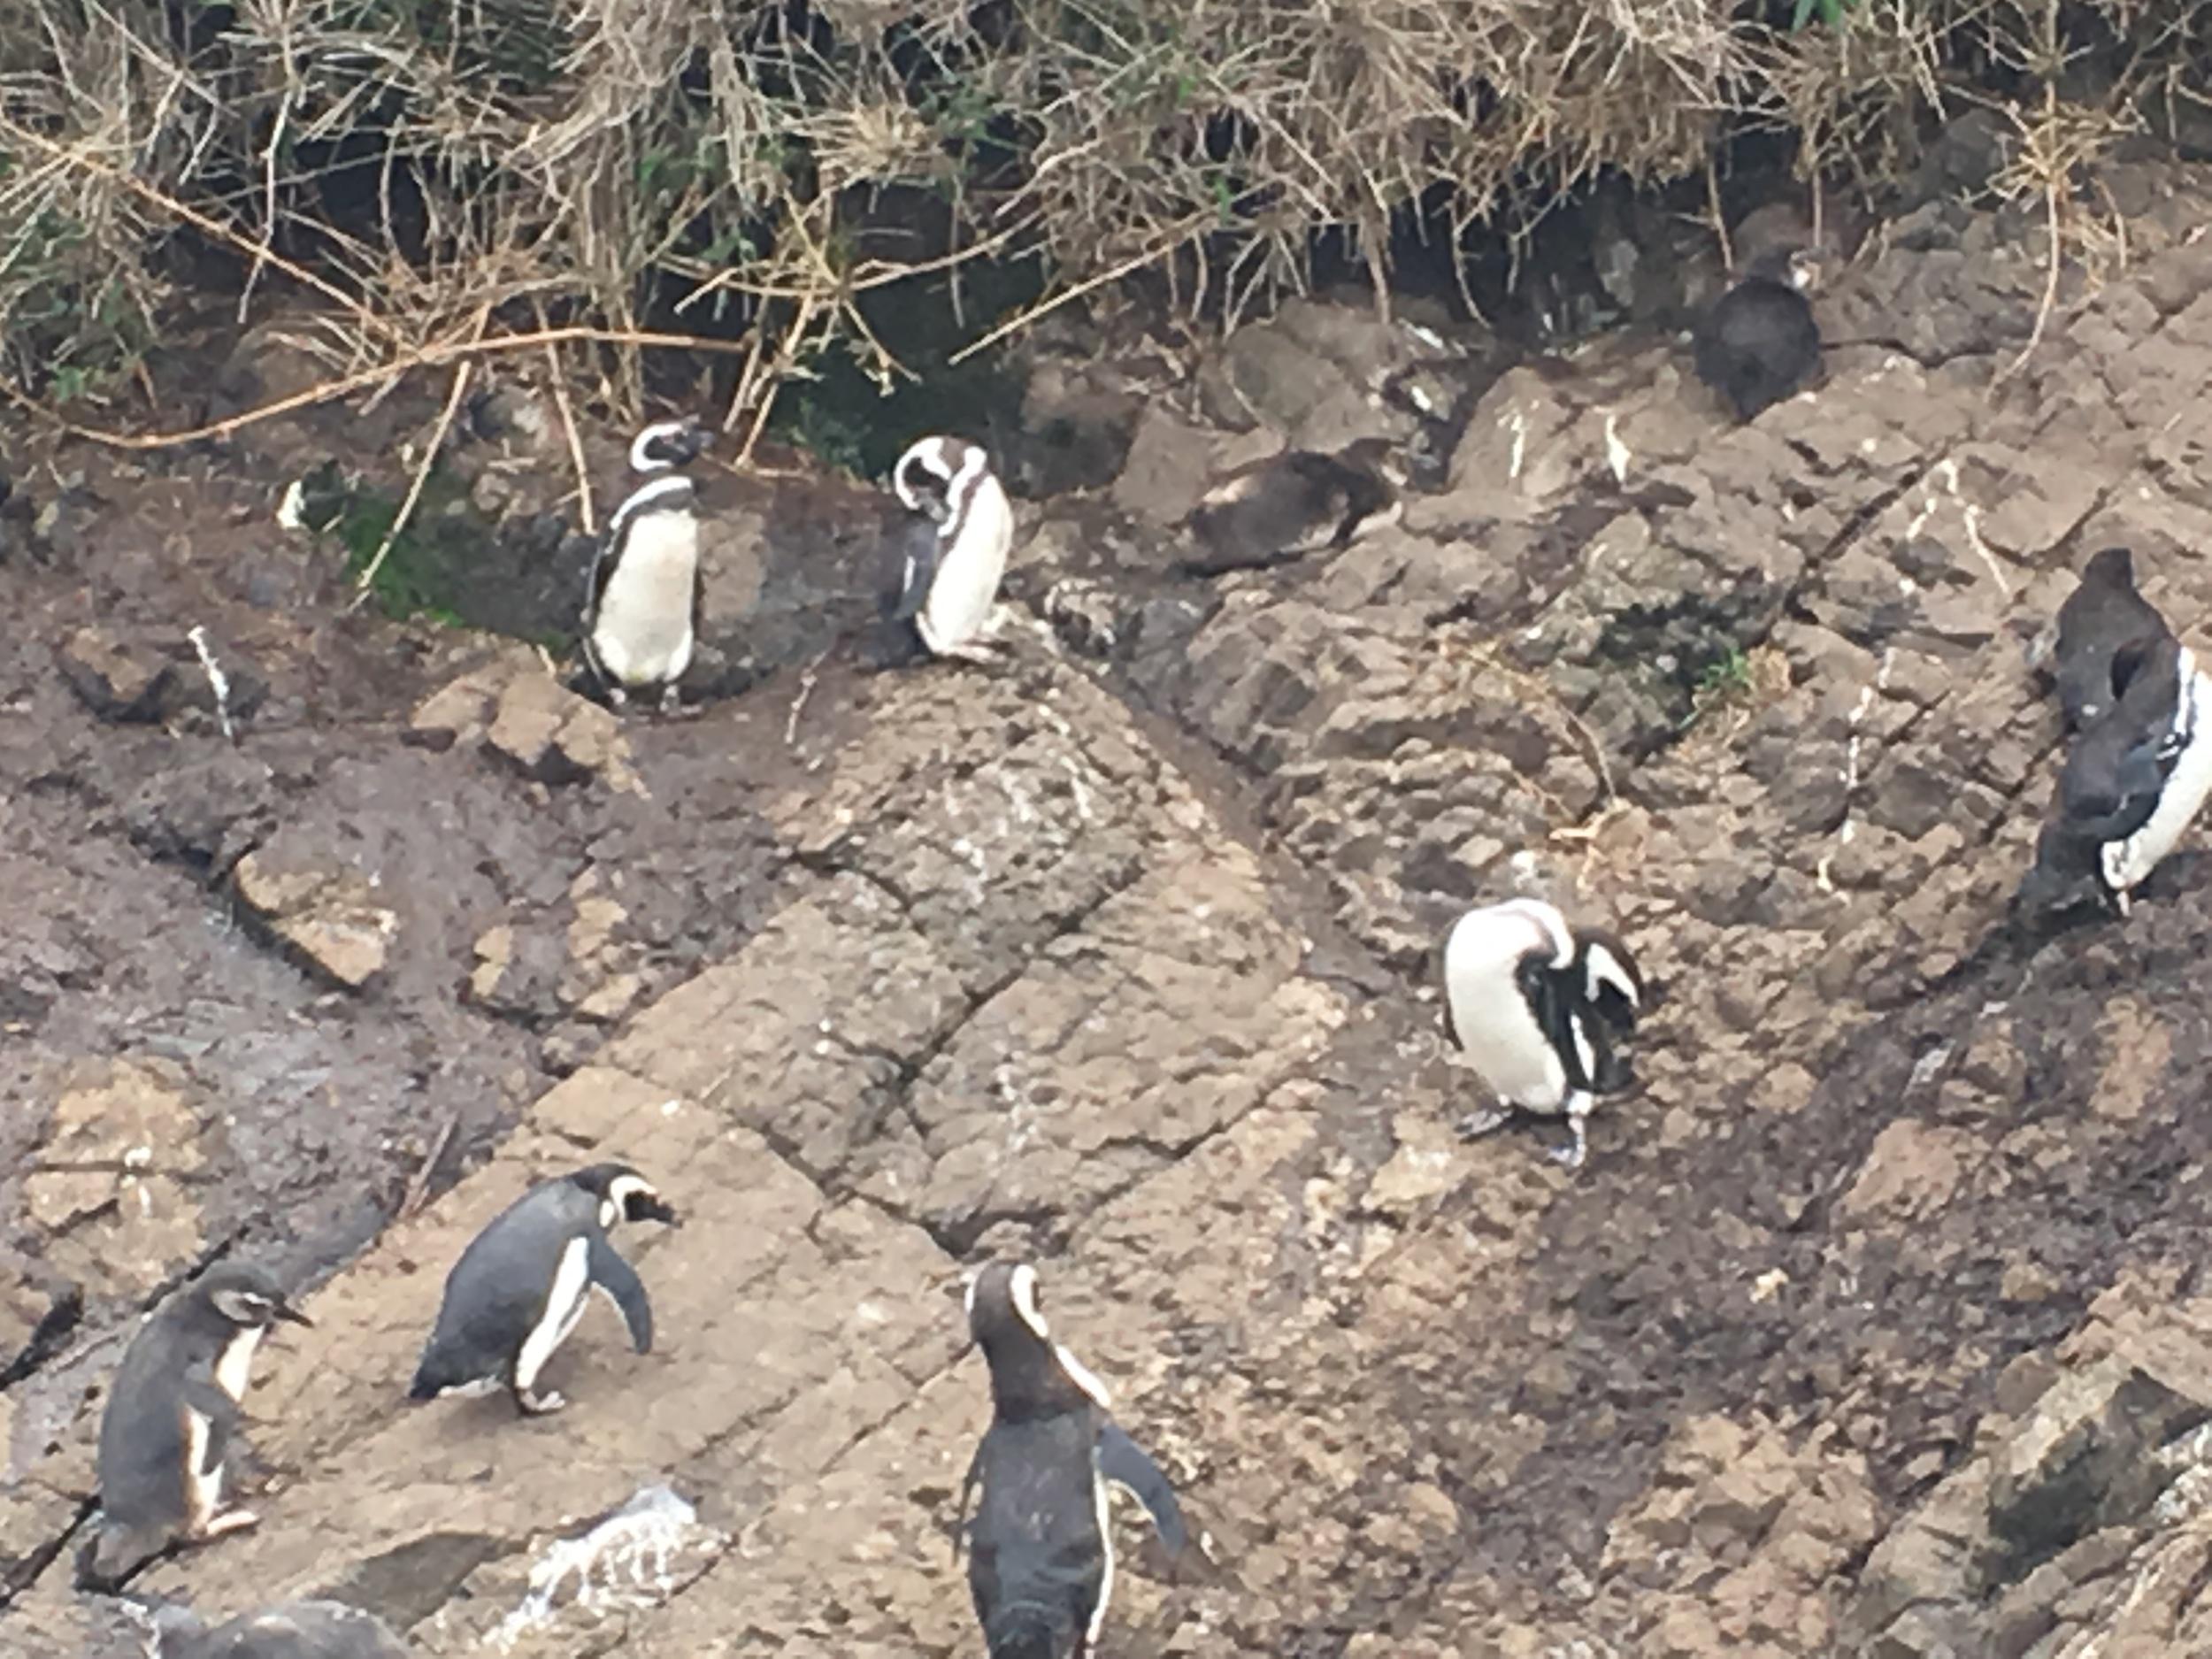 Penguins on little island off coast of big island Chiloe